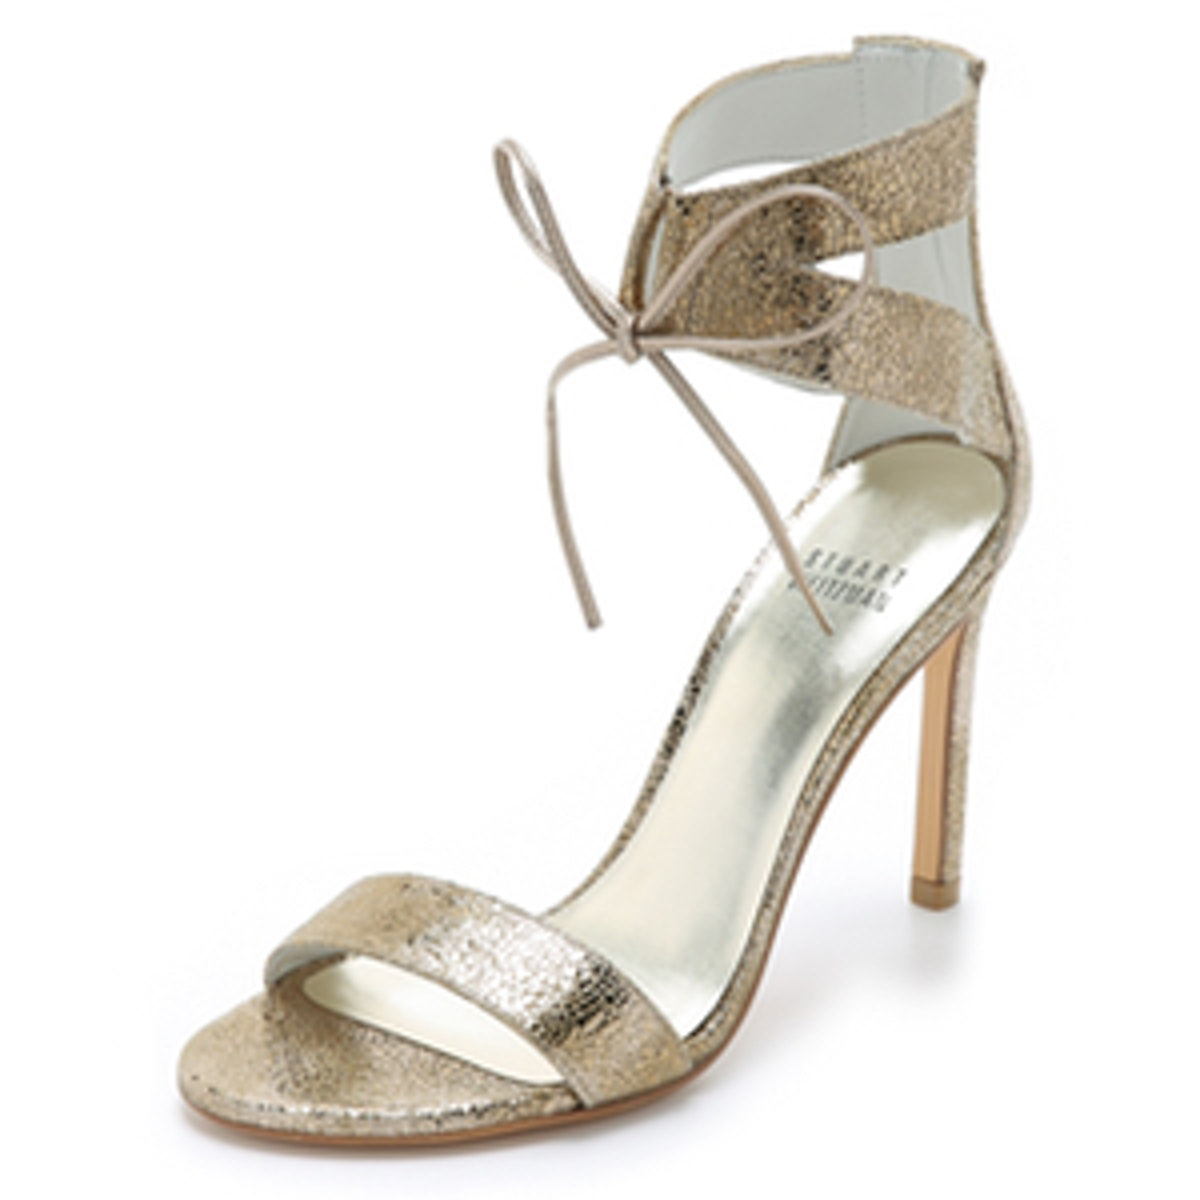 Tynela Ankle Tie Sandals